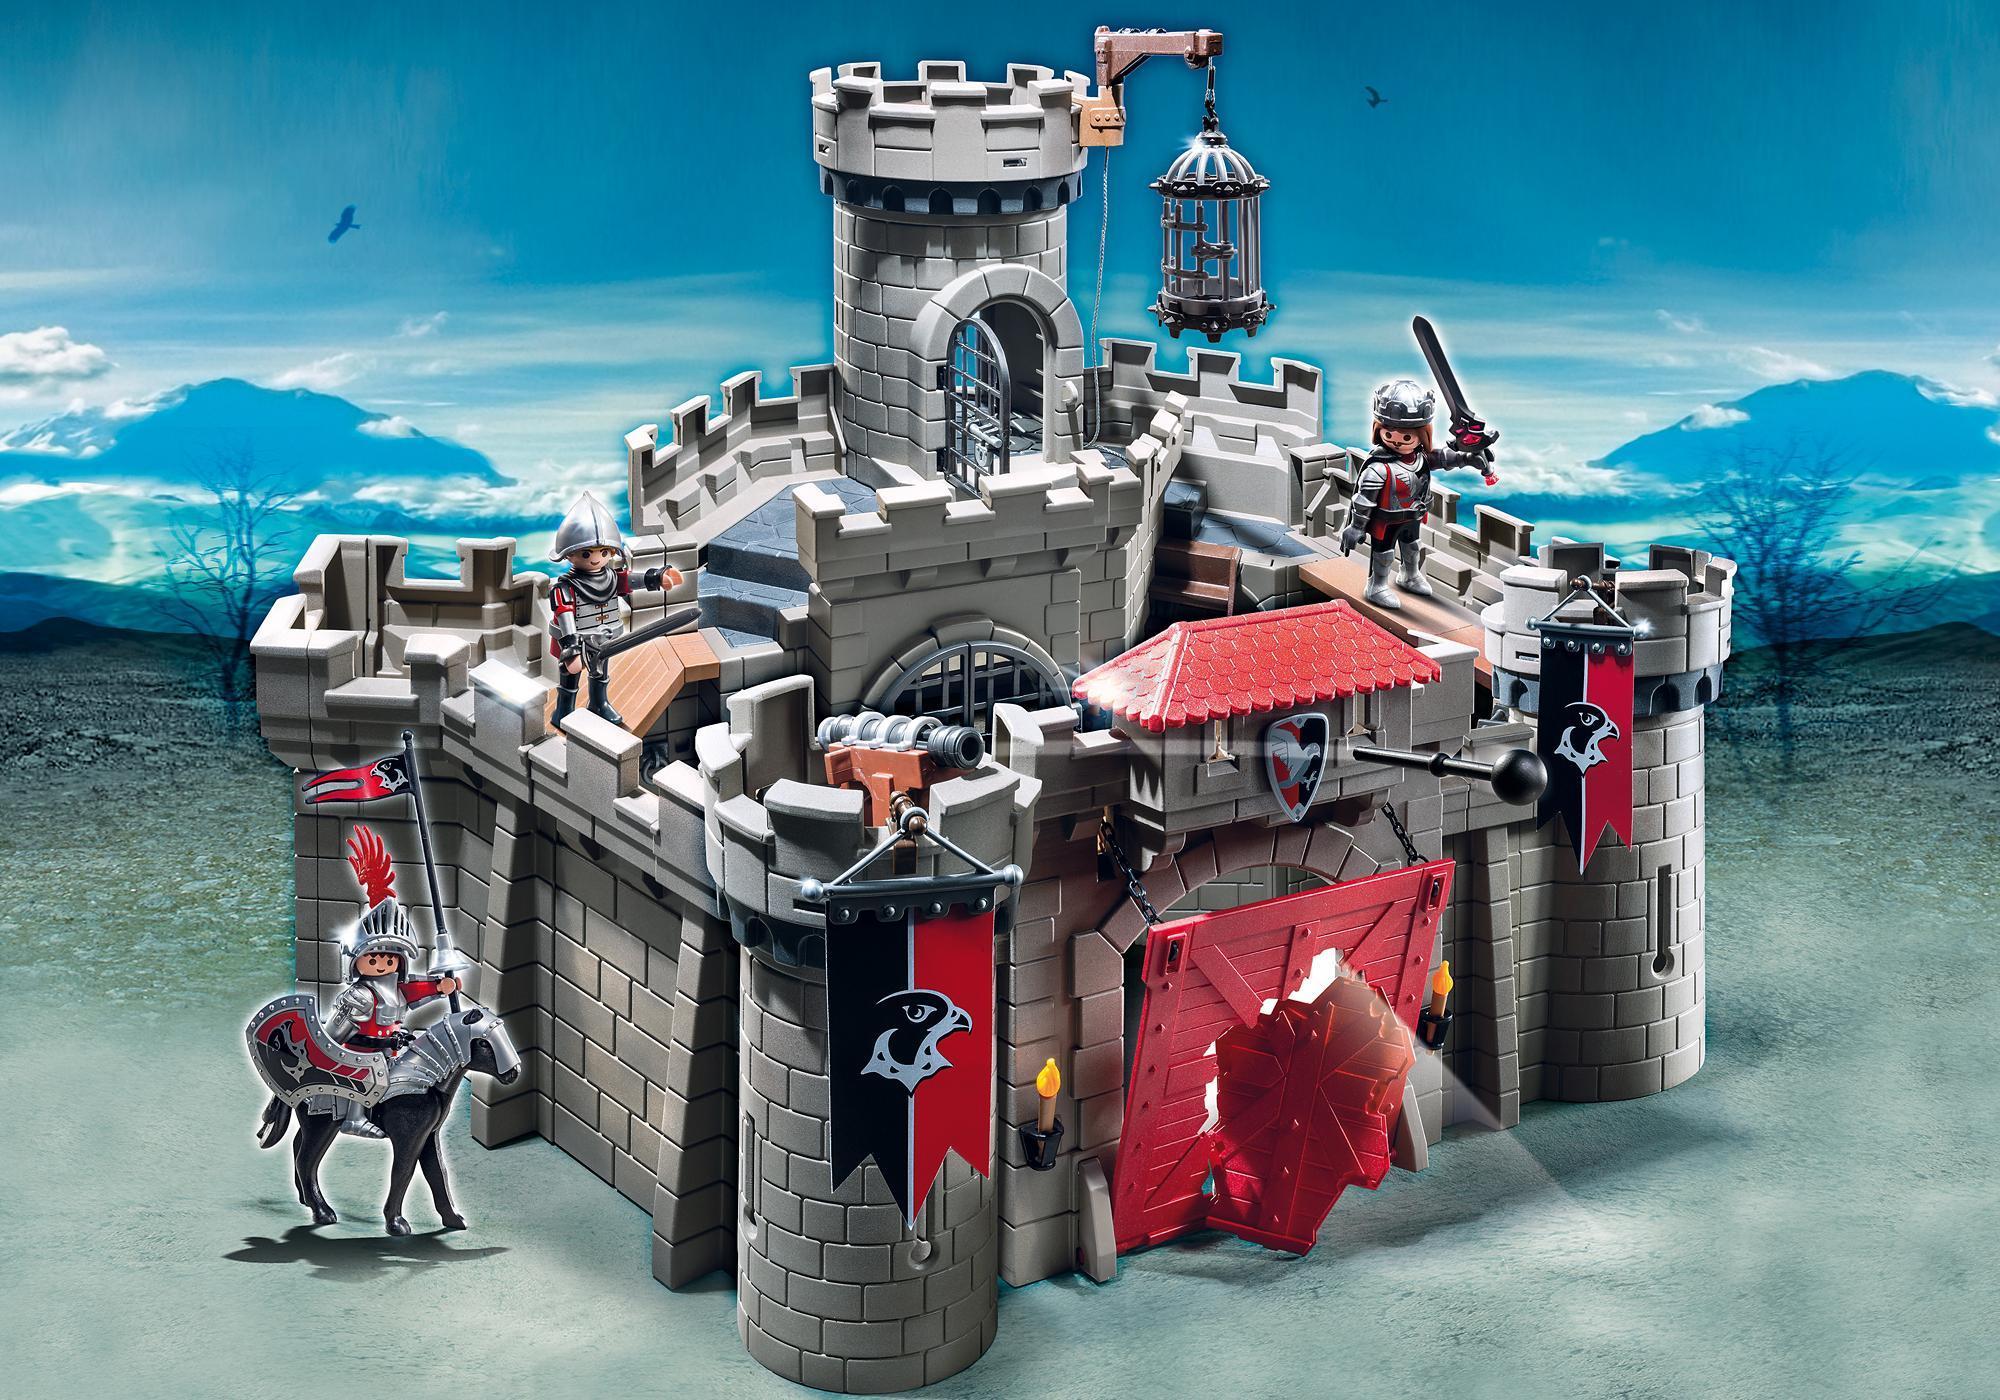 http://media.playmobil.com/i/playmobil/6001_product_detail/Burcht van de orde van de Valkenridders